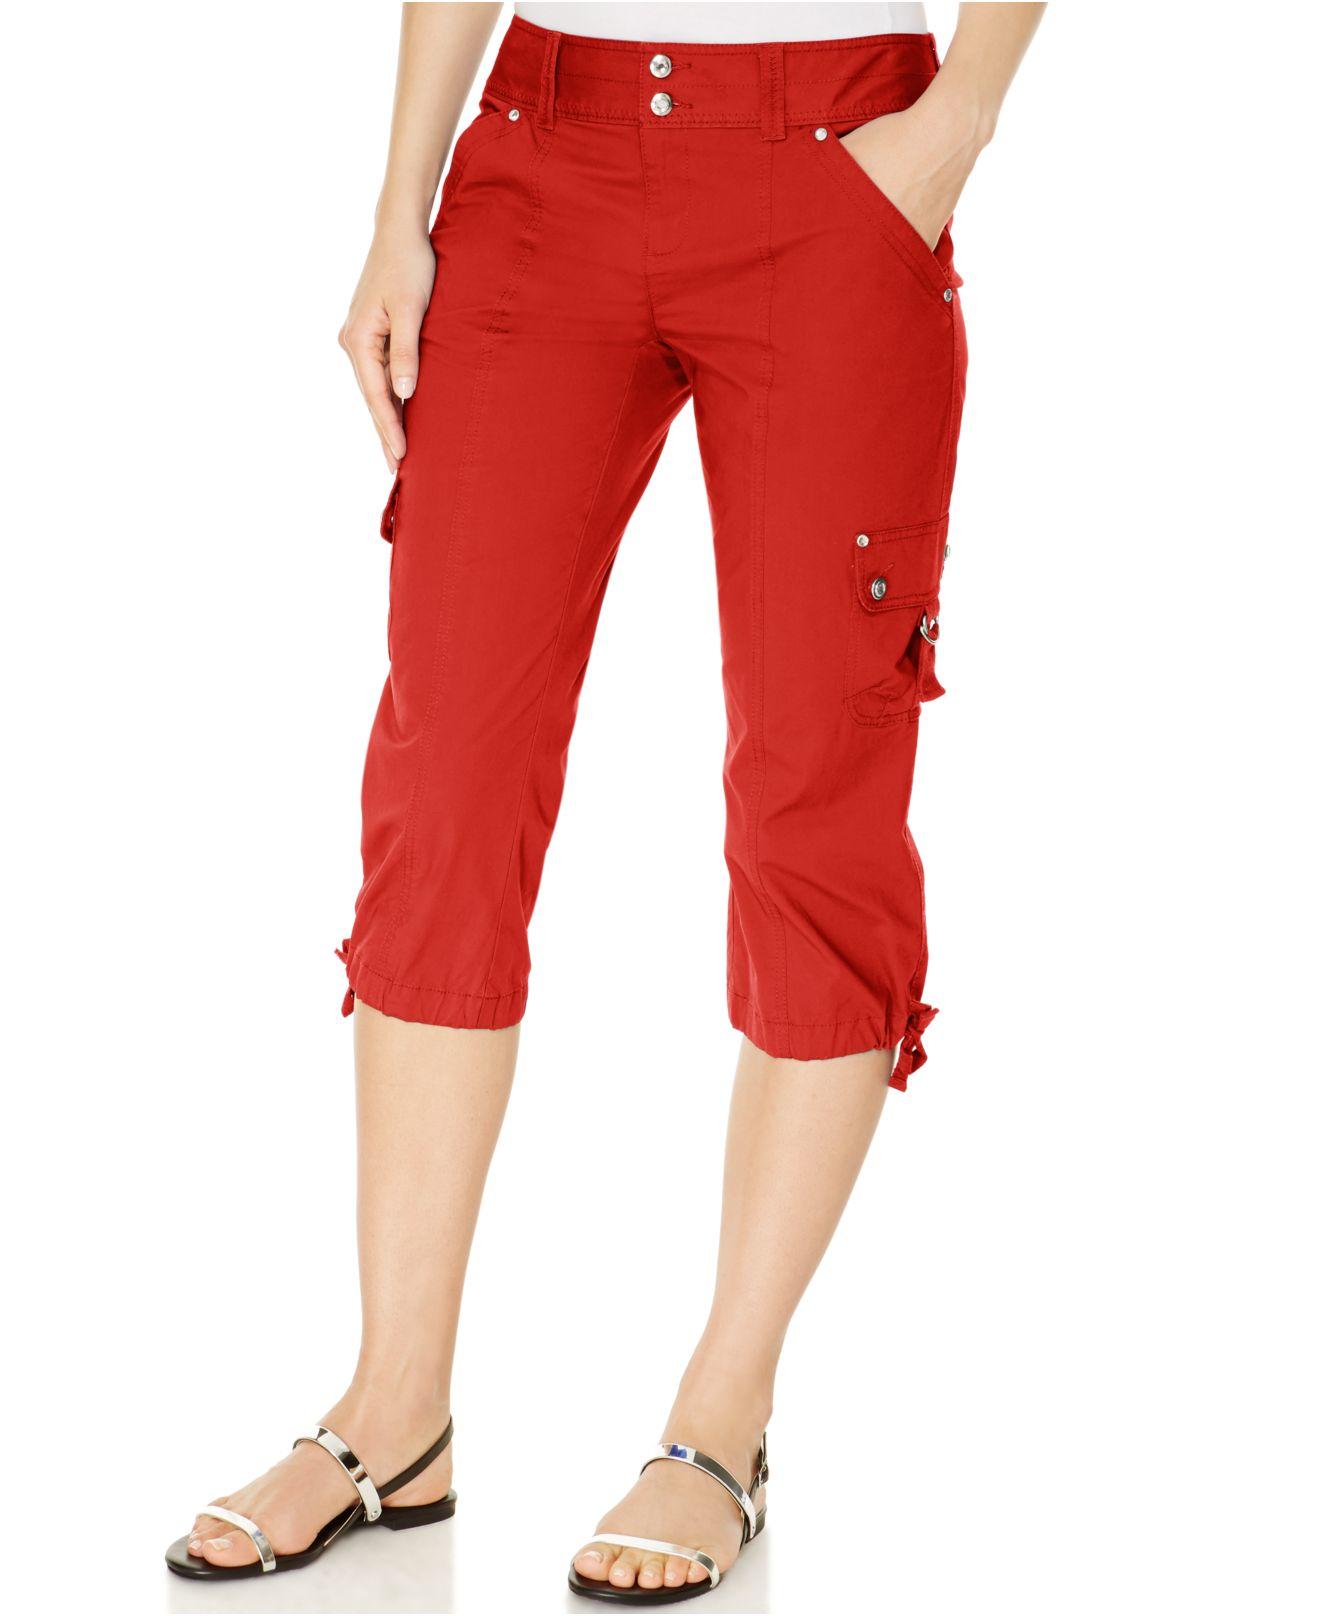 Innovative StyleampCo Style Amp Co Petite Cargo Capri Pants  ShopStylecouk Women